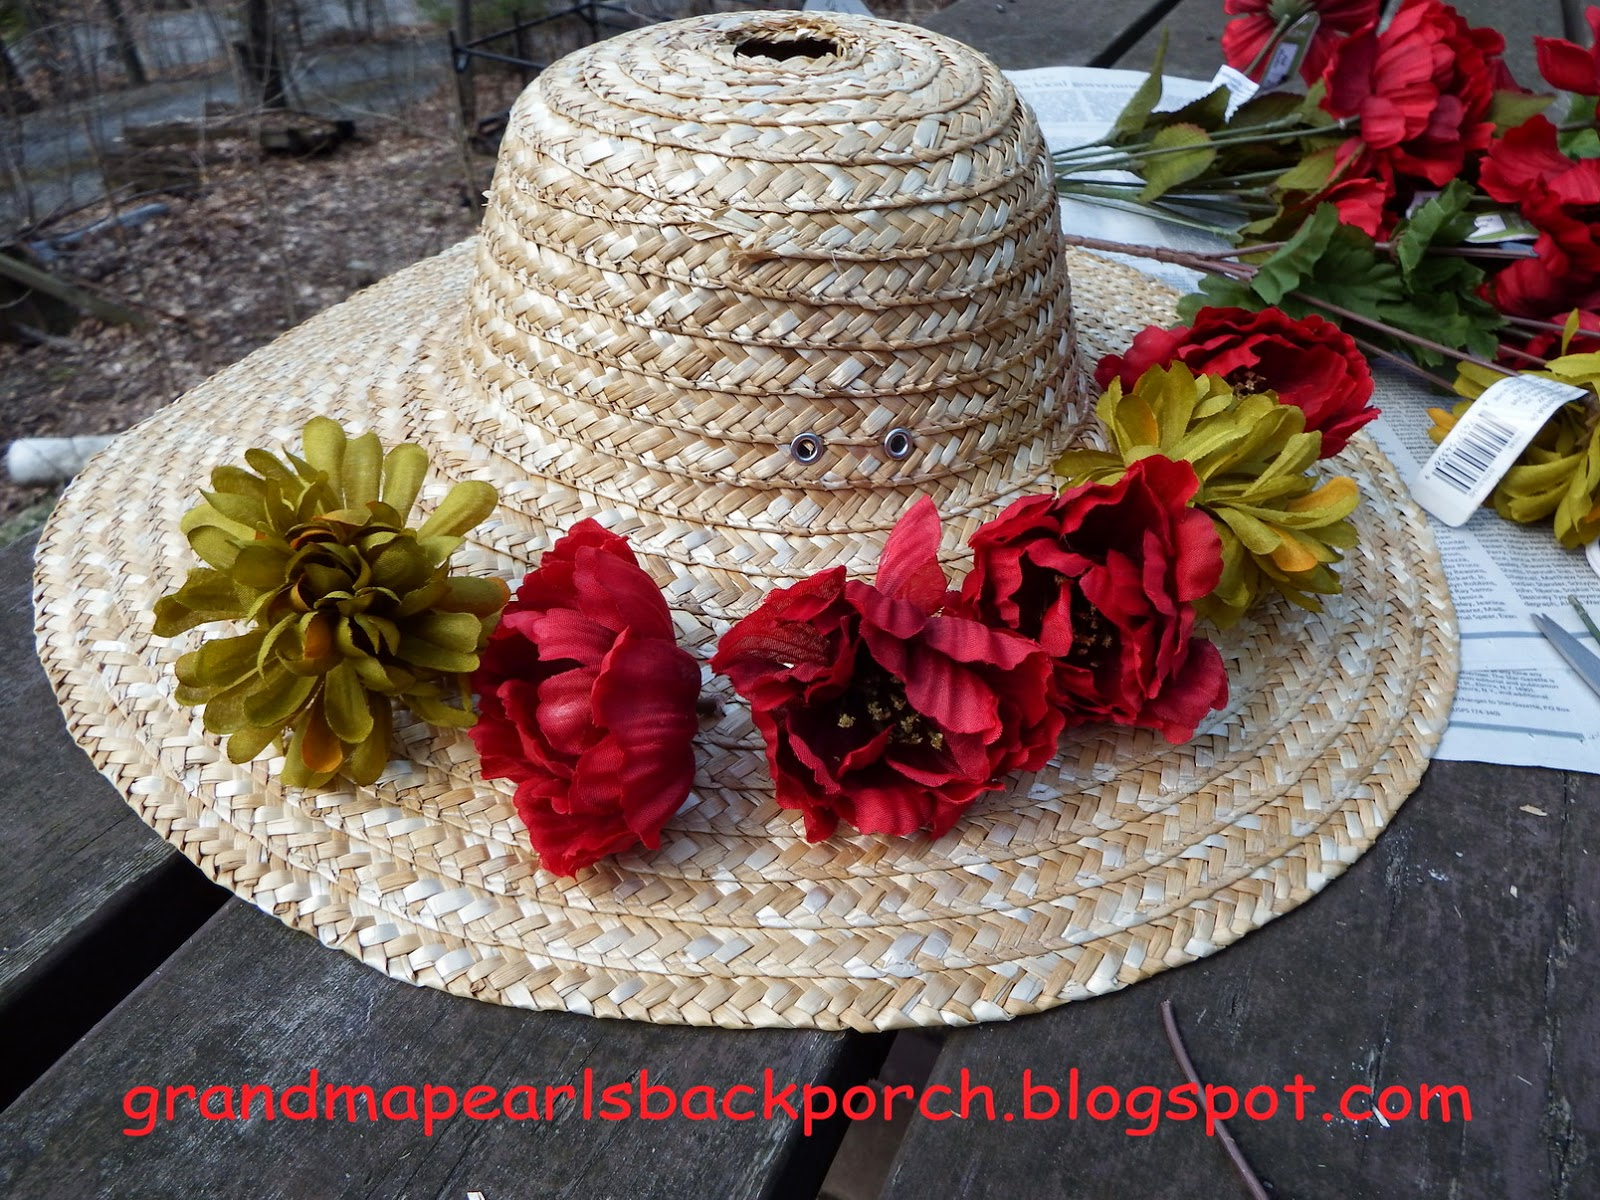 Grandma Pearls Backporch Easy Straw Hat Bird House